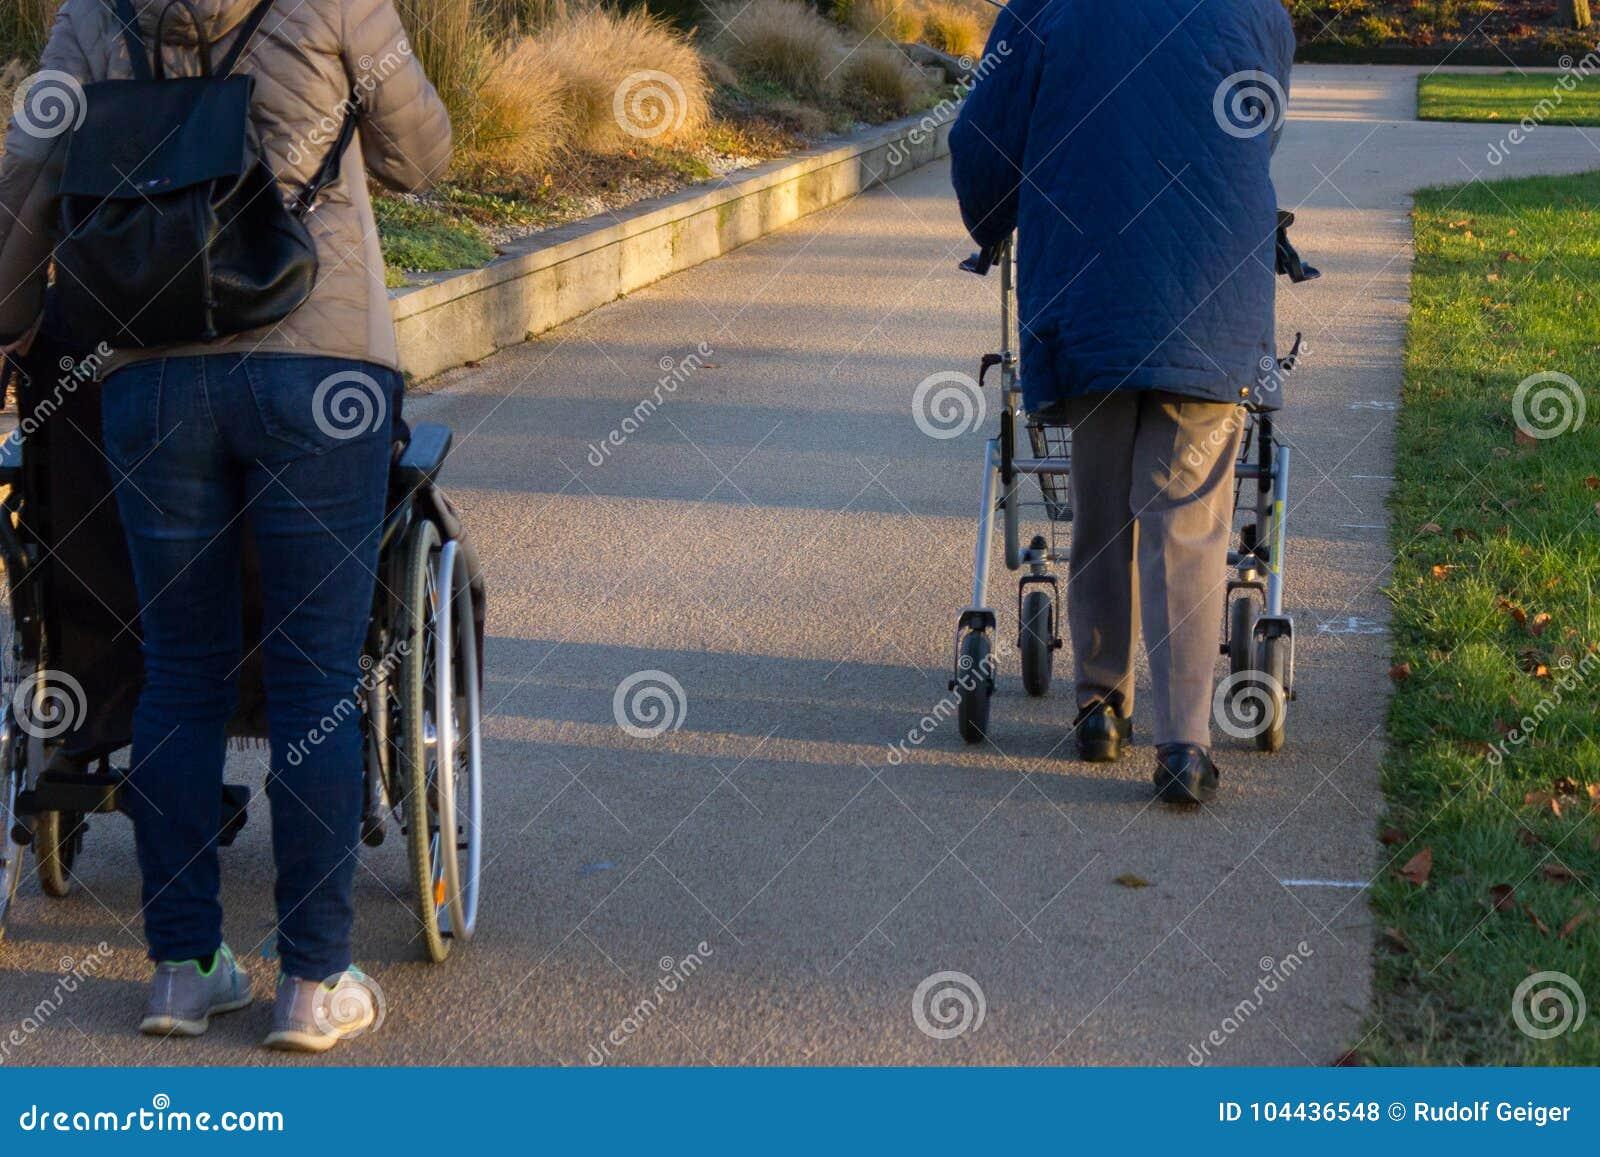 Rollator και αναπηρική καρέκλα με τον πρεσβύτερο στο ιστορικό πάρκο